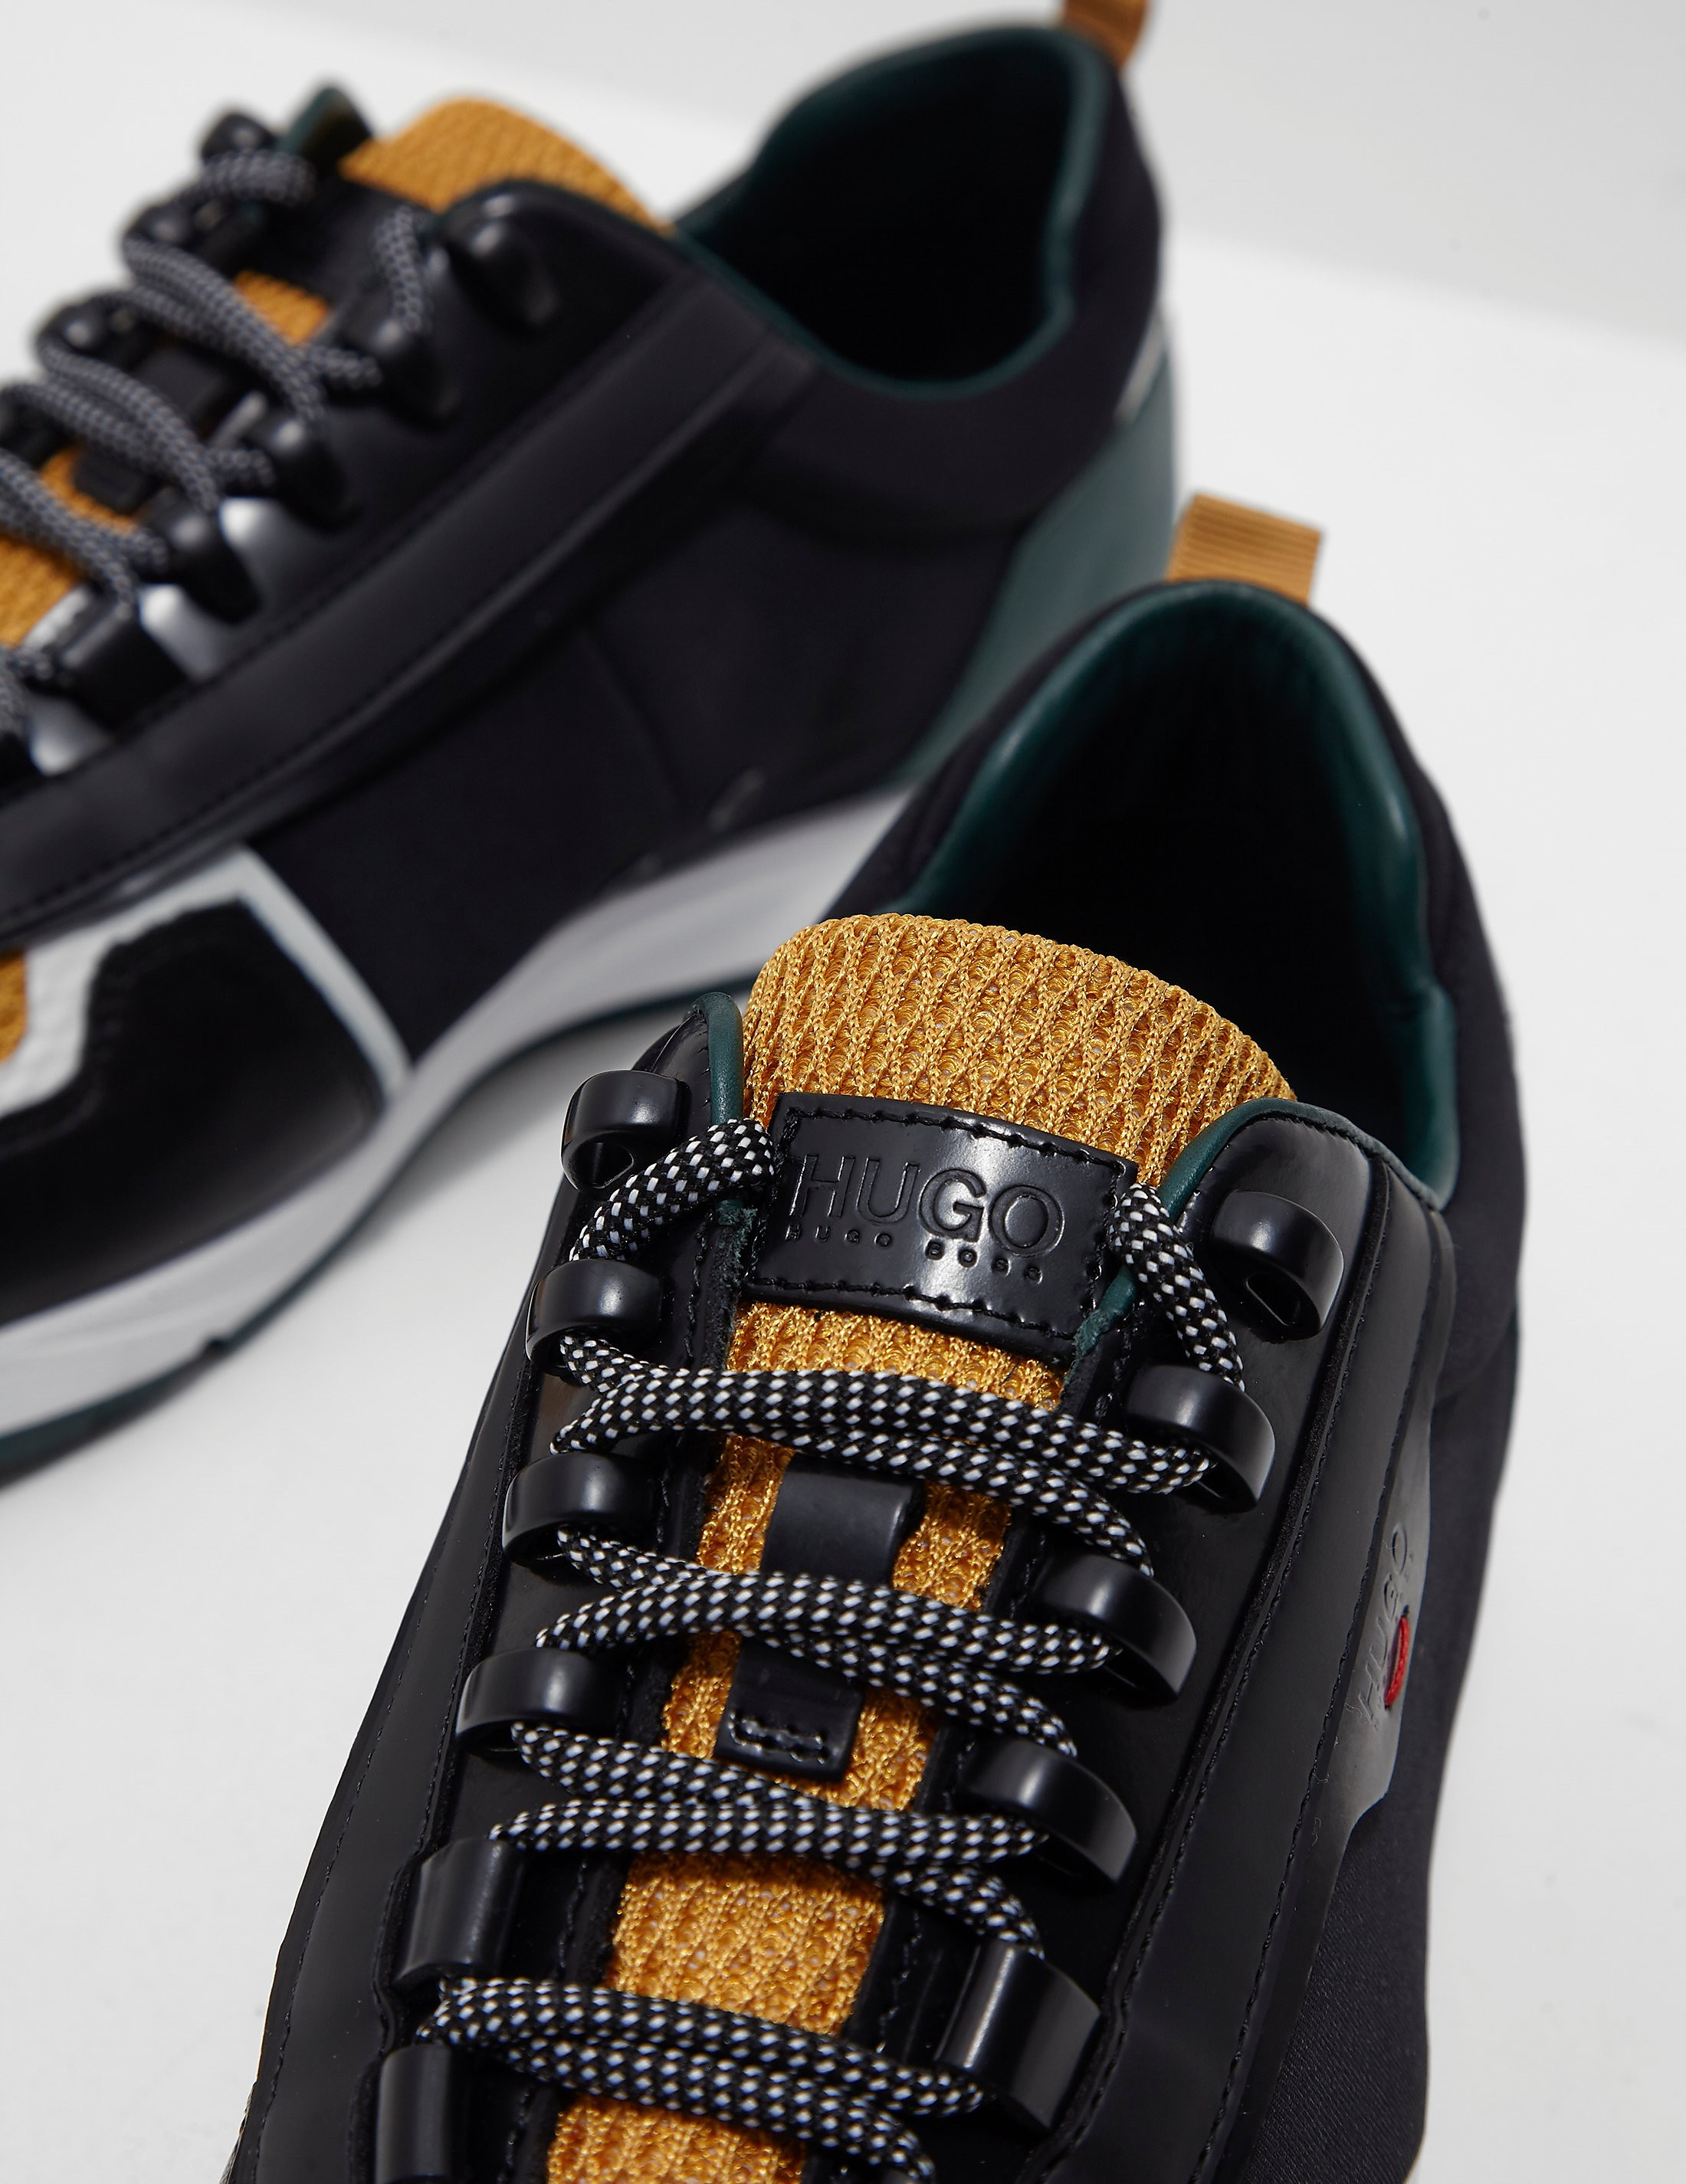 HUGO Hybrid Leather